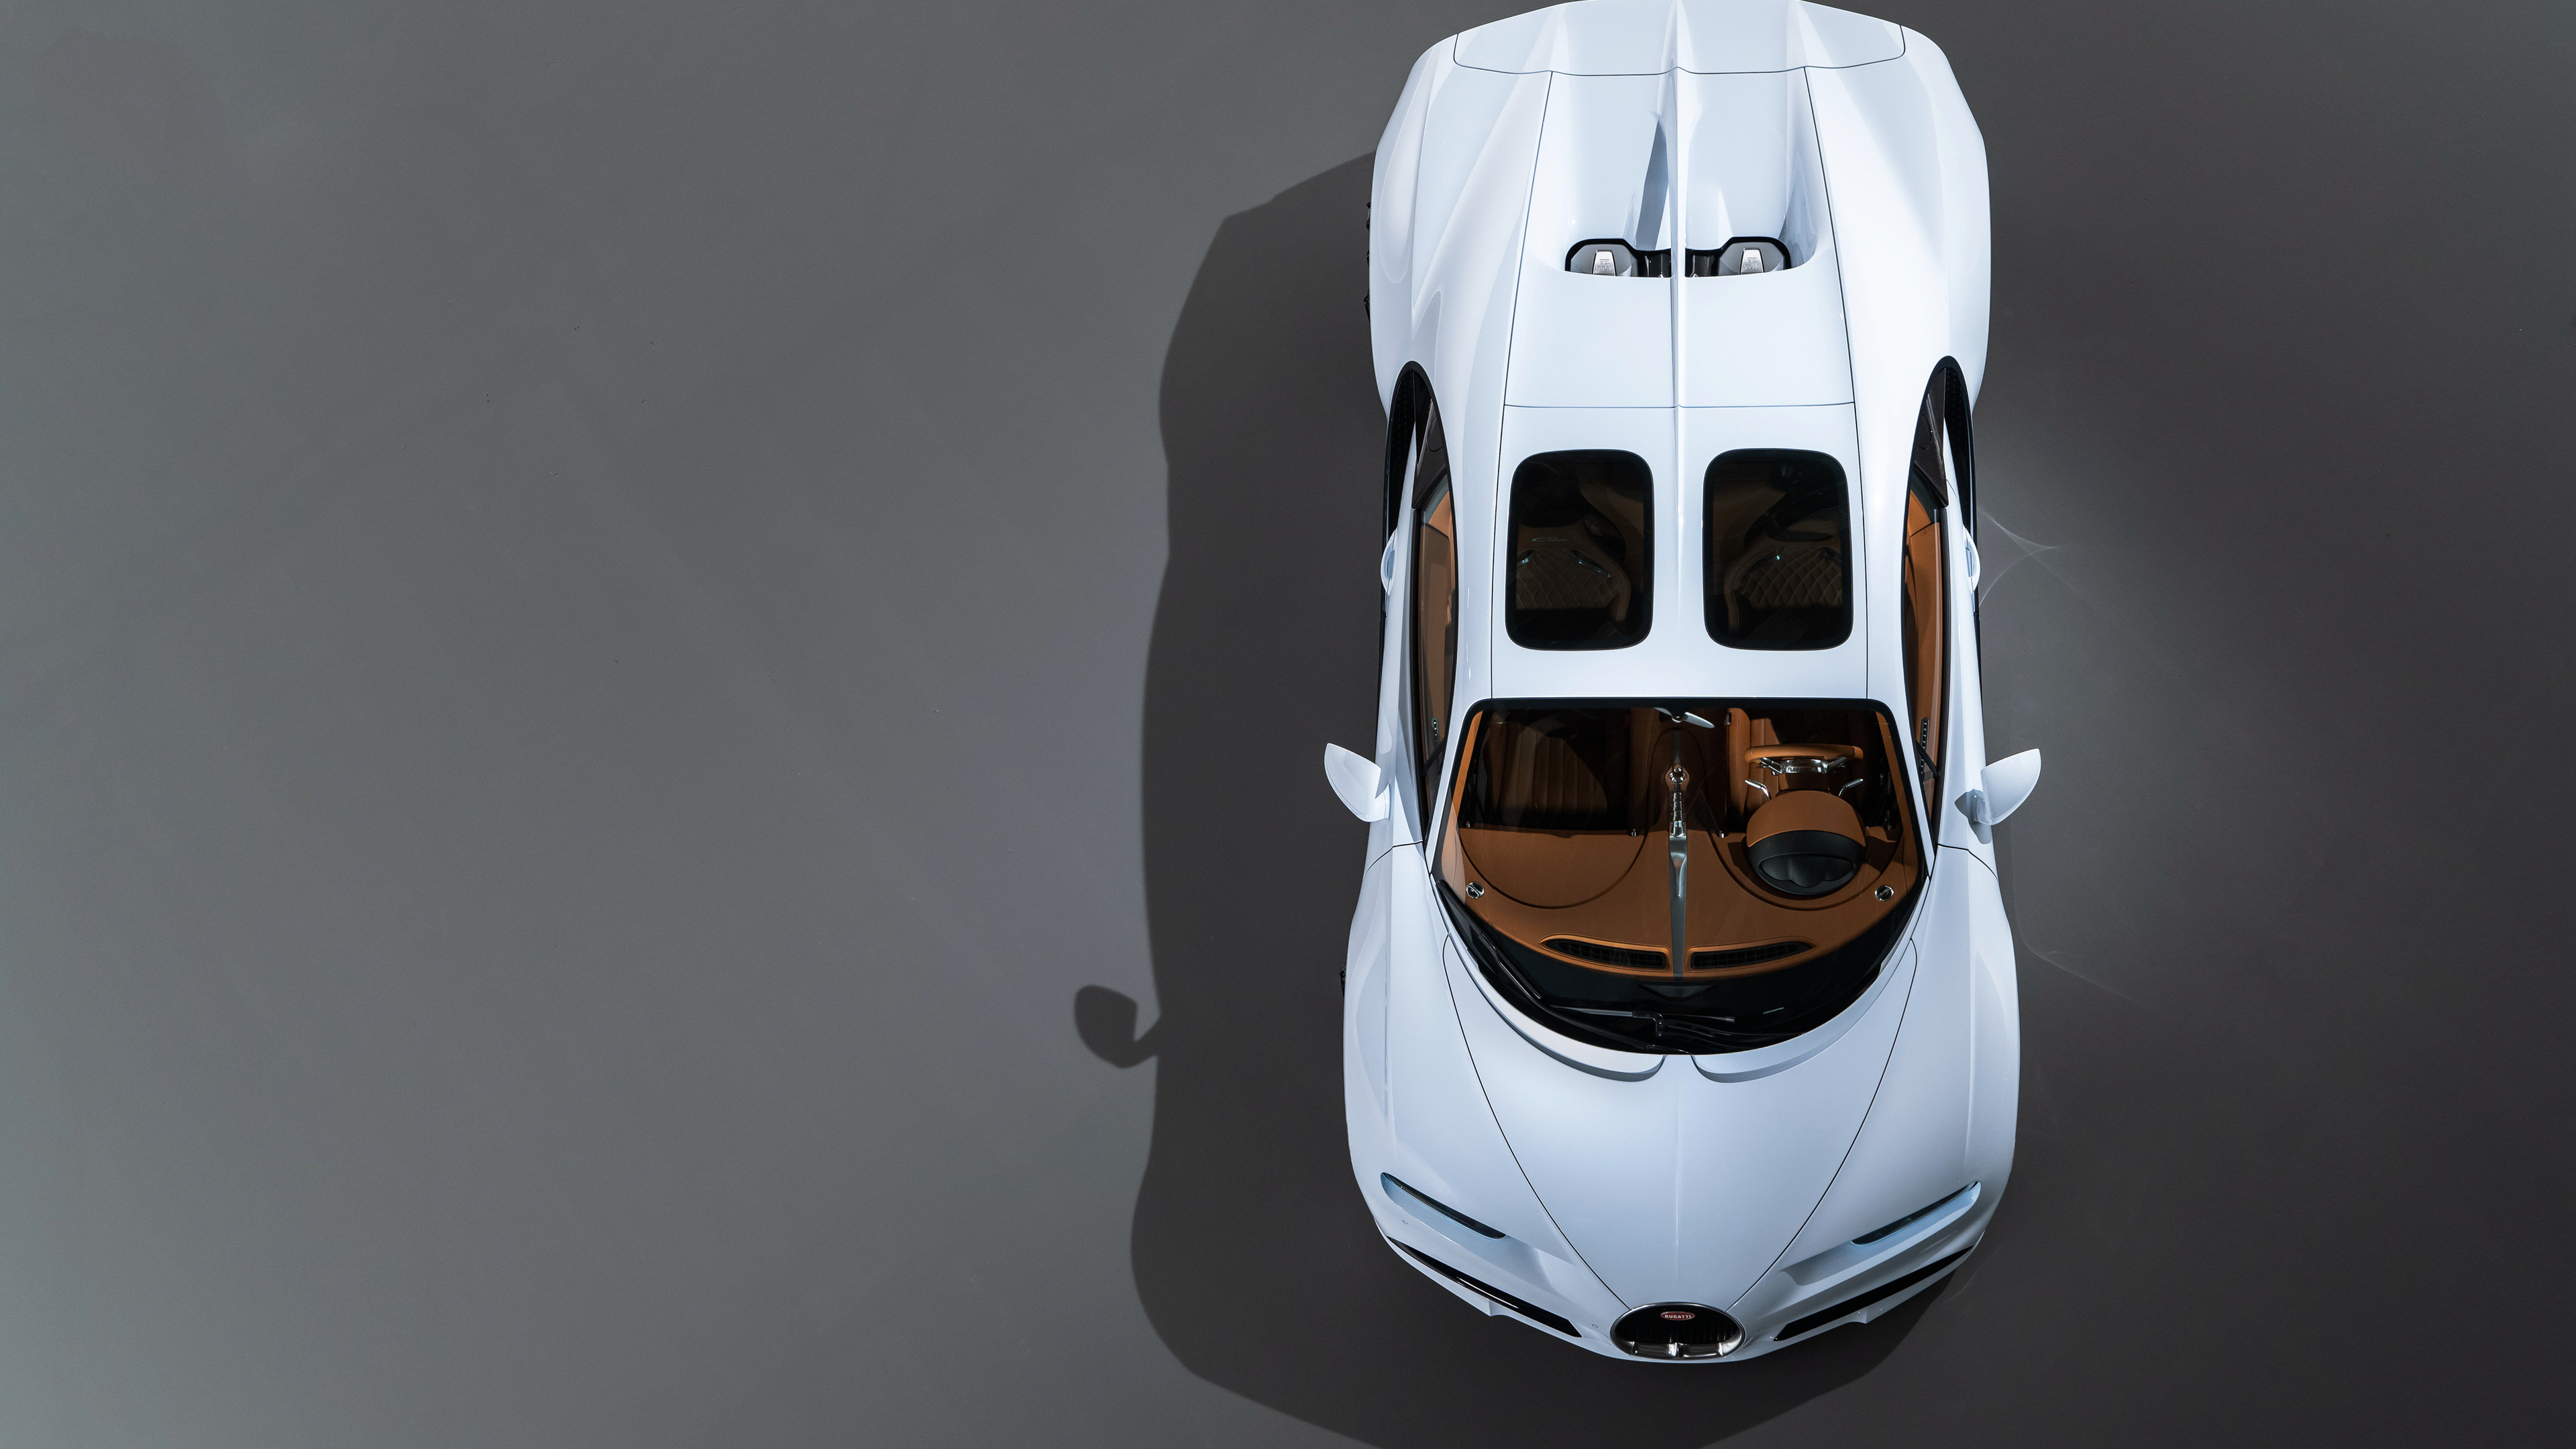 2018 bugatti chiron sky view 4k 1539792831 - 2018 Bugatti Chiron Sky View 4k - hd-wallpapers, cars wallpapers, bugatti chiron wallpapers, bugatti chiron sky view wallpapers, 4k-wallpapers, 2018 cars wallpapers